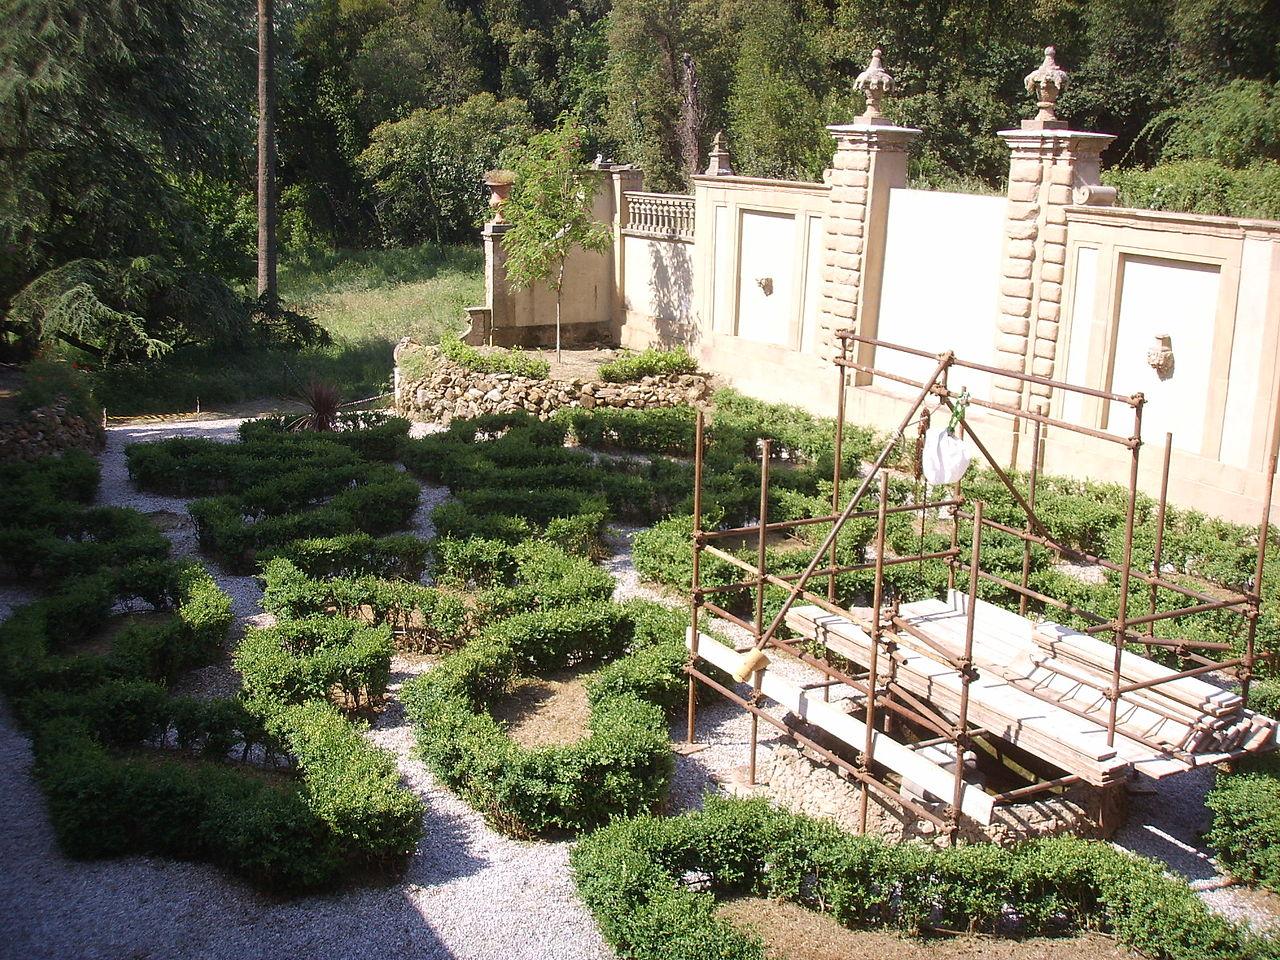 File villa salviati giardino all 39 italiana jpg wikipedia - Giardino all italiana ...